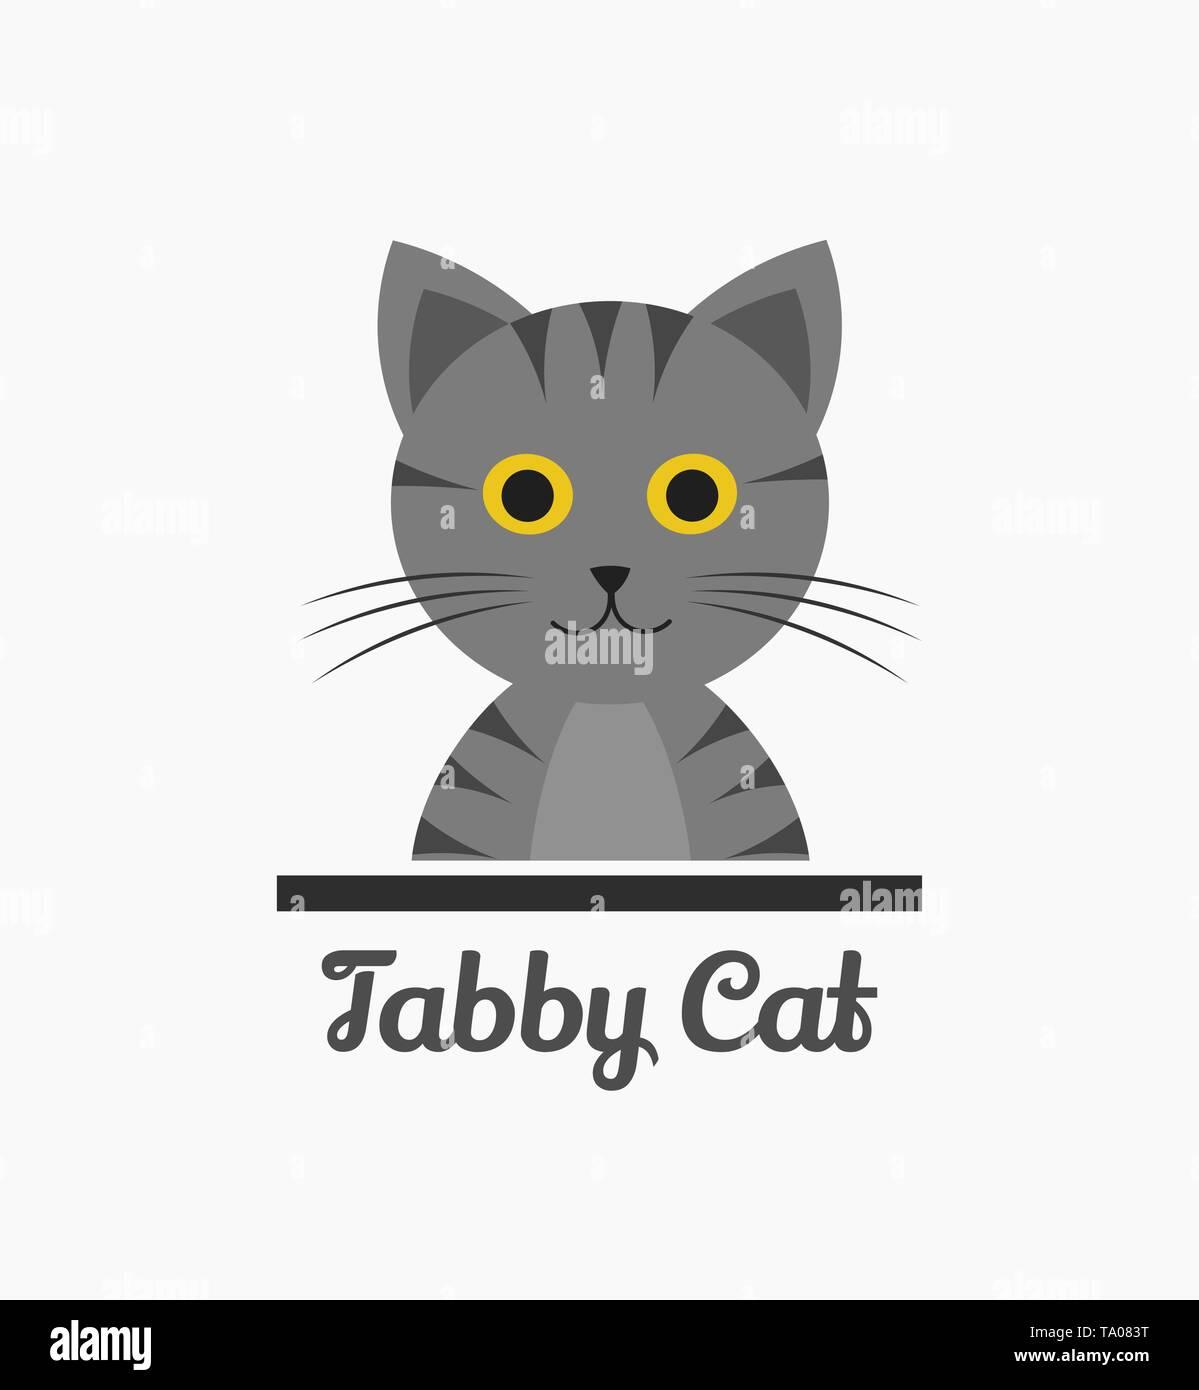 Cute tabby cat. Vector illustration - Stock Image